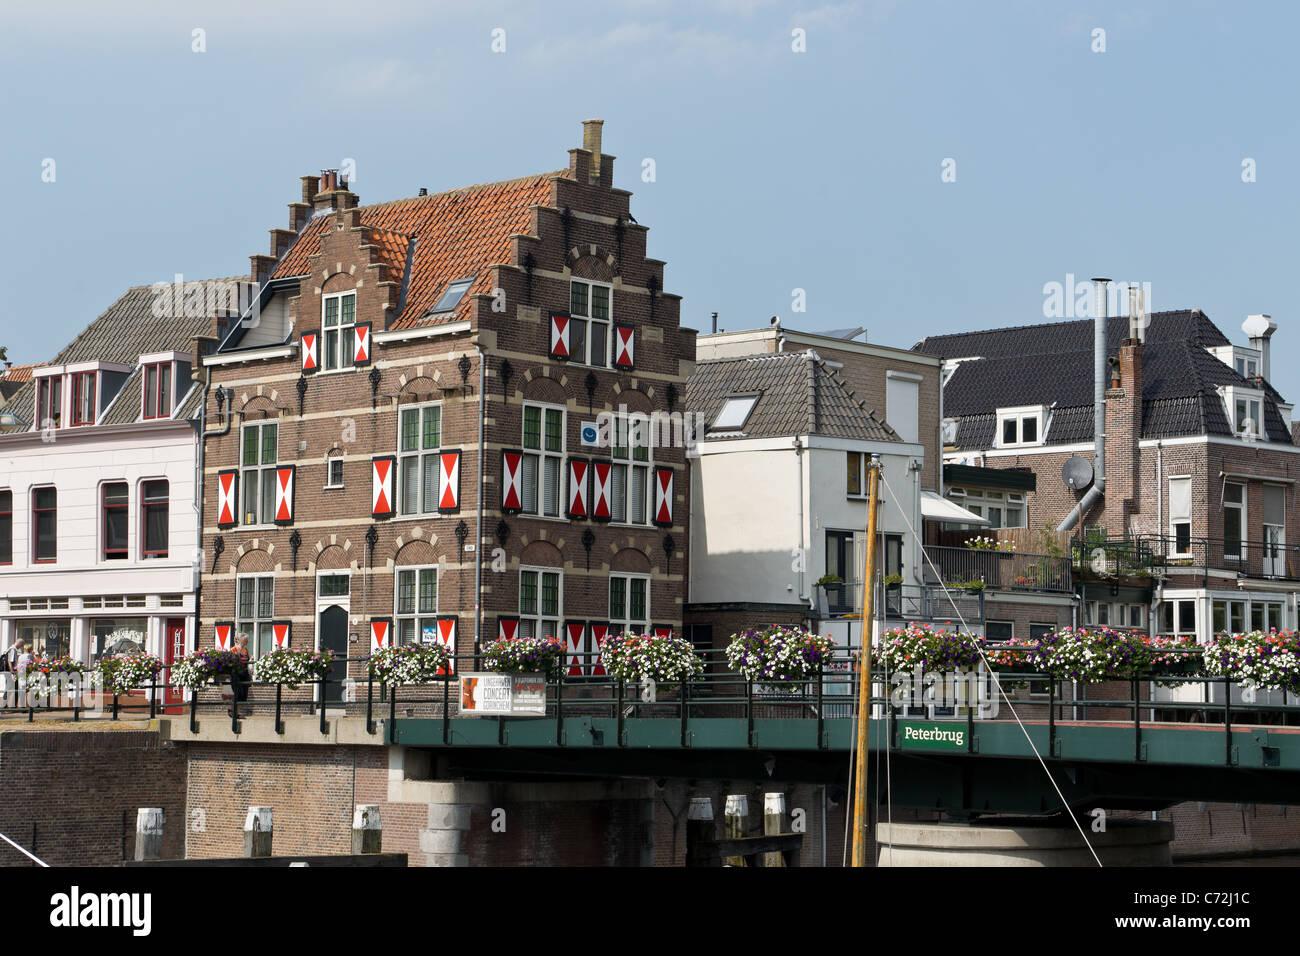 Bridge keeper house and the Peterbrug, Gorinchem, Holland. Stock Photo